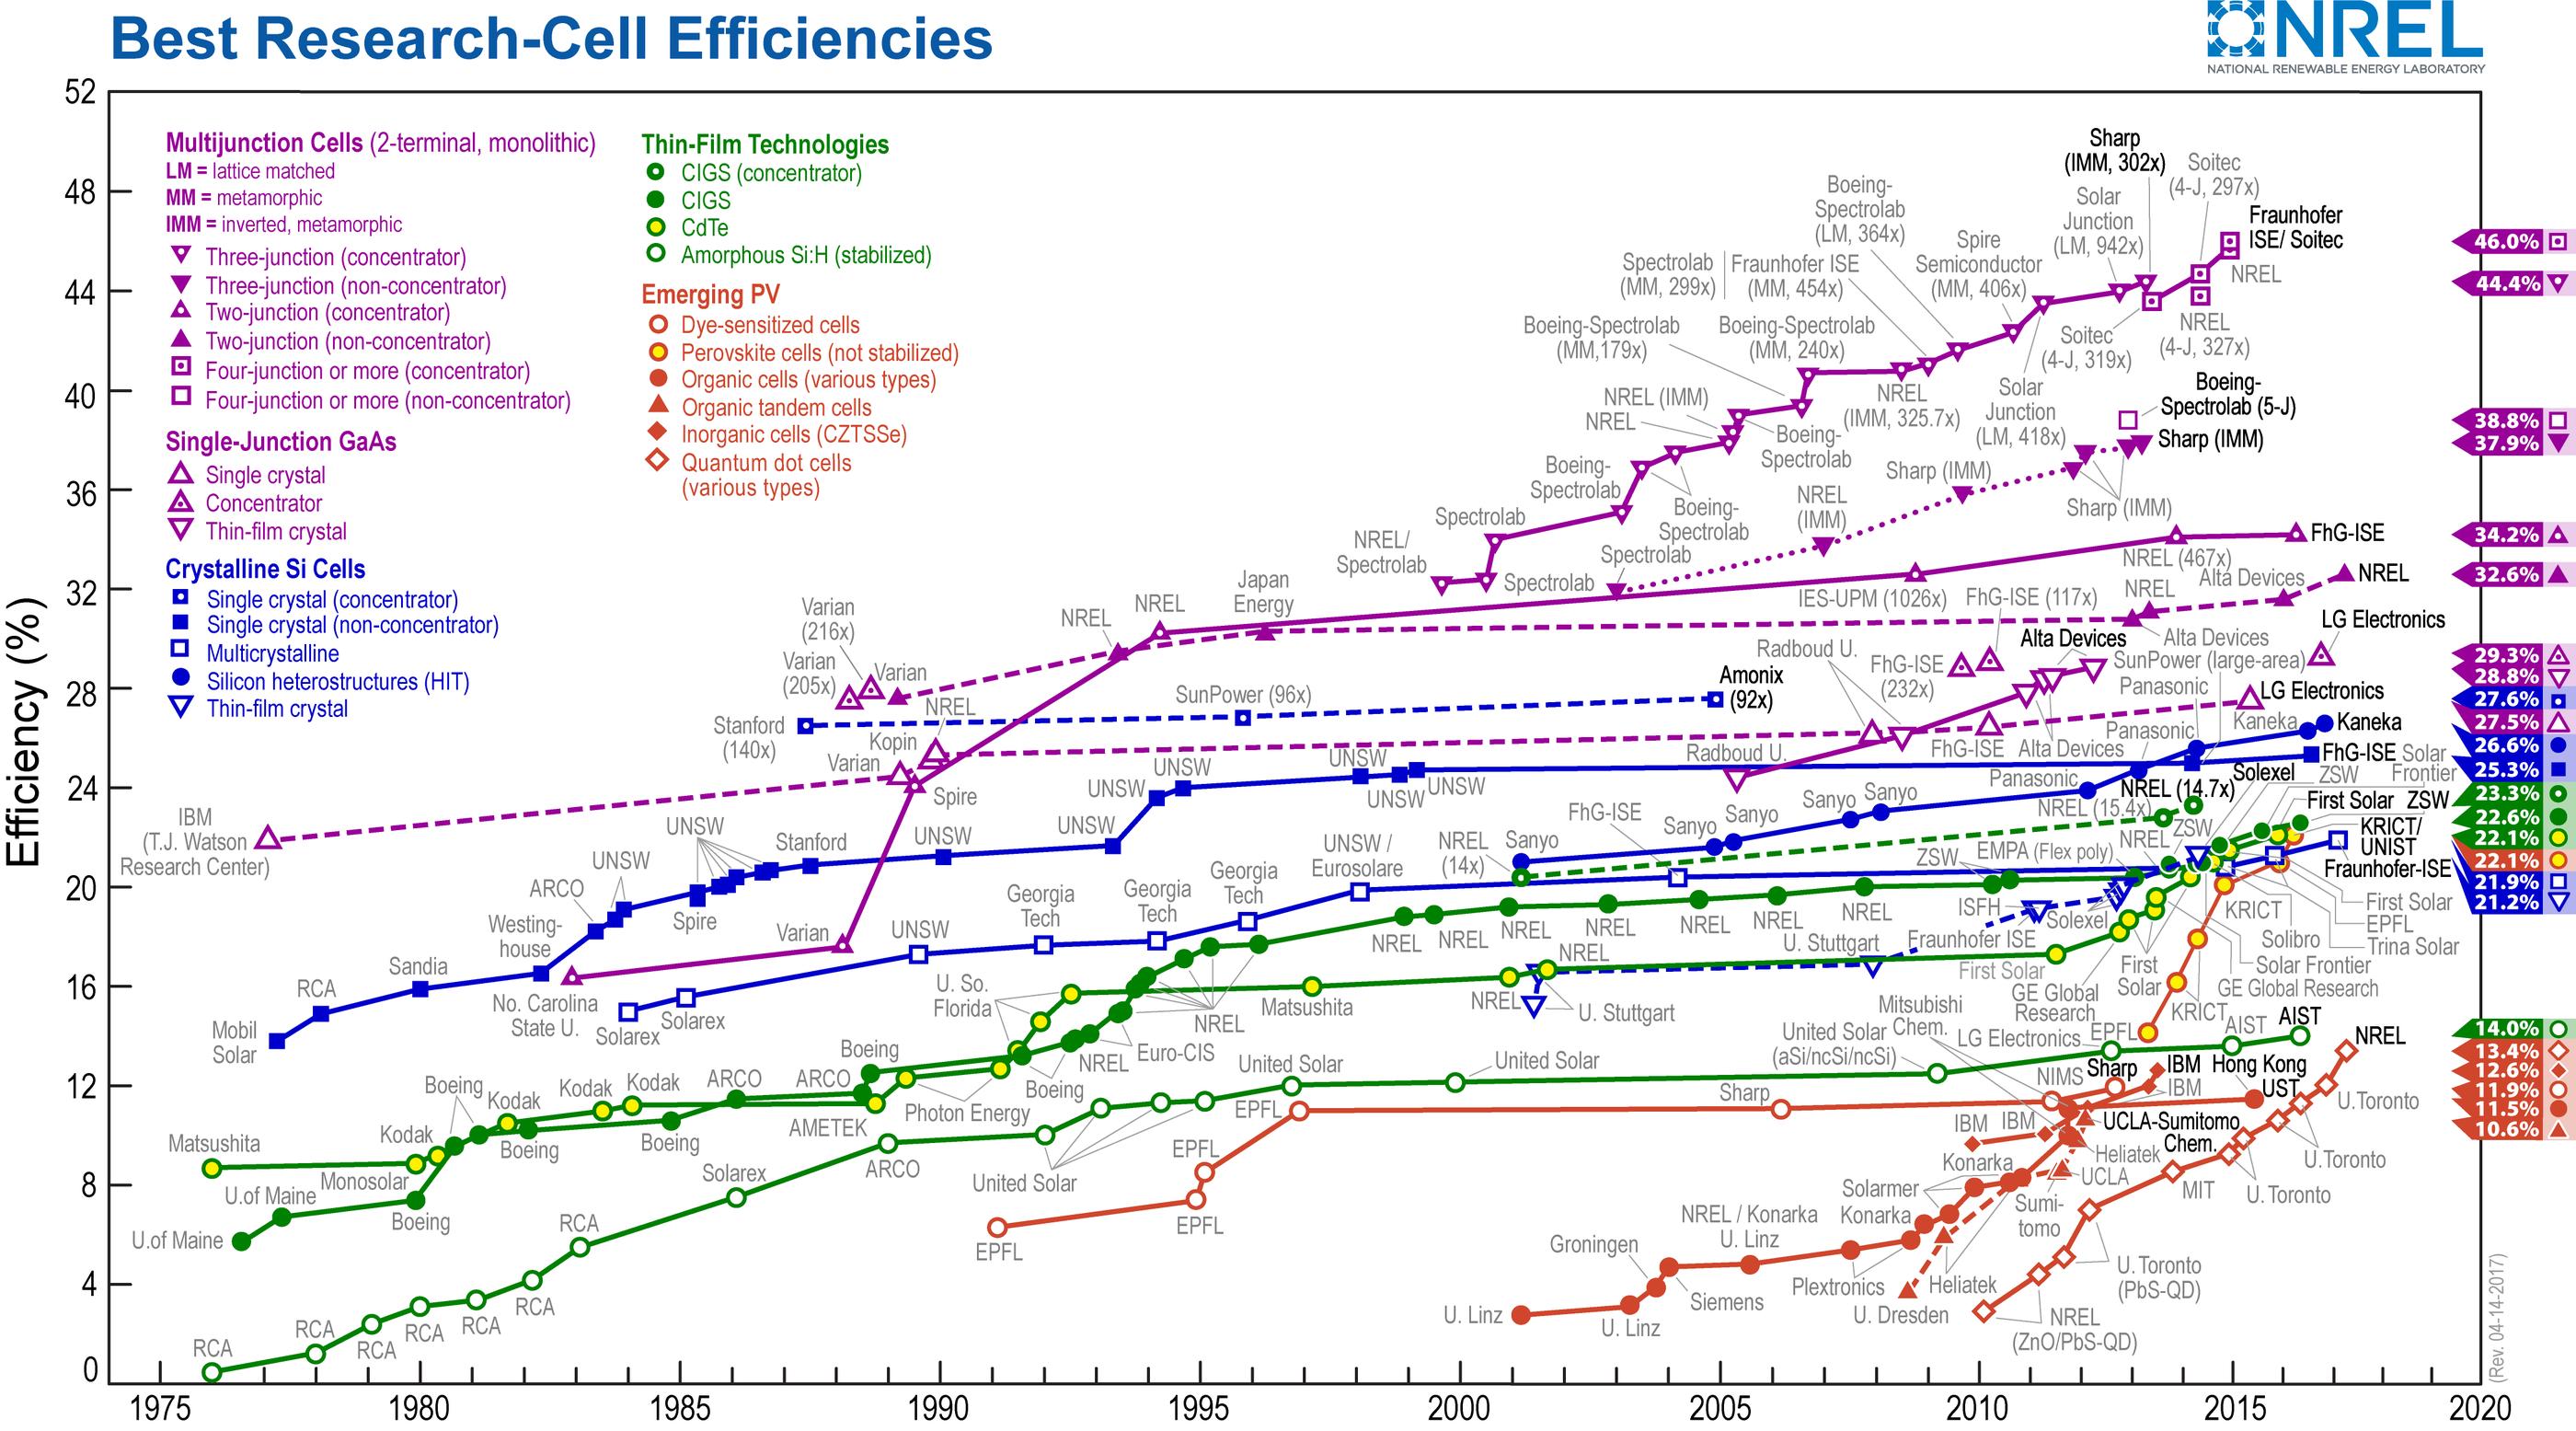 soberanía eléctrica investigación en células fotovoltaicas